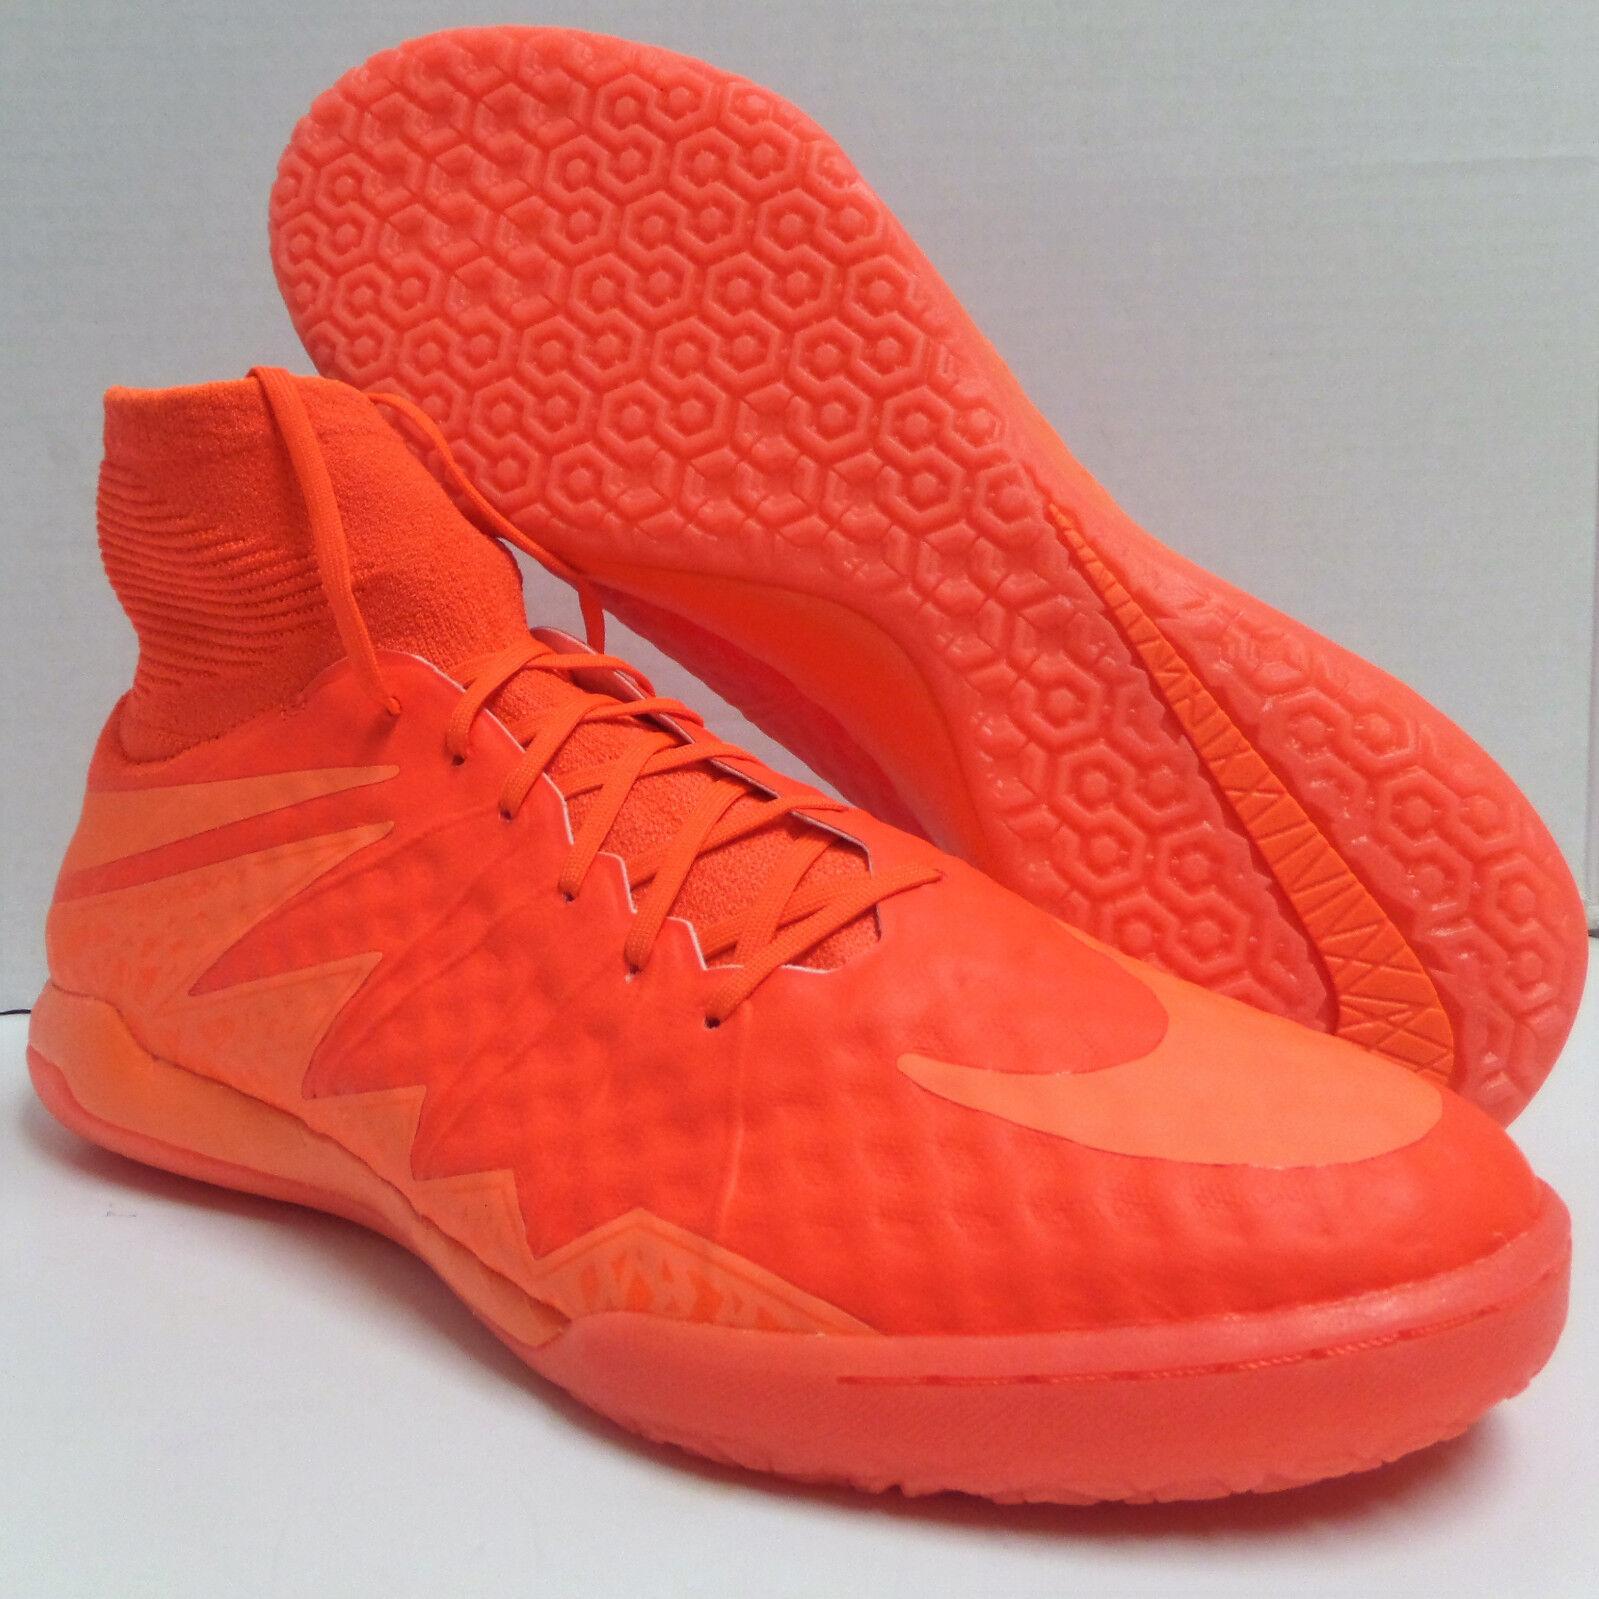 New Men's Nike HypervenomX Proximo IC Size 12 Crimson/Orange Indoor Soccer Shoes